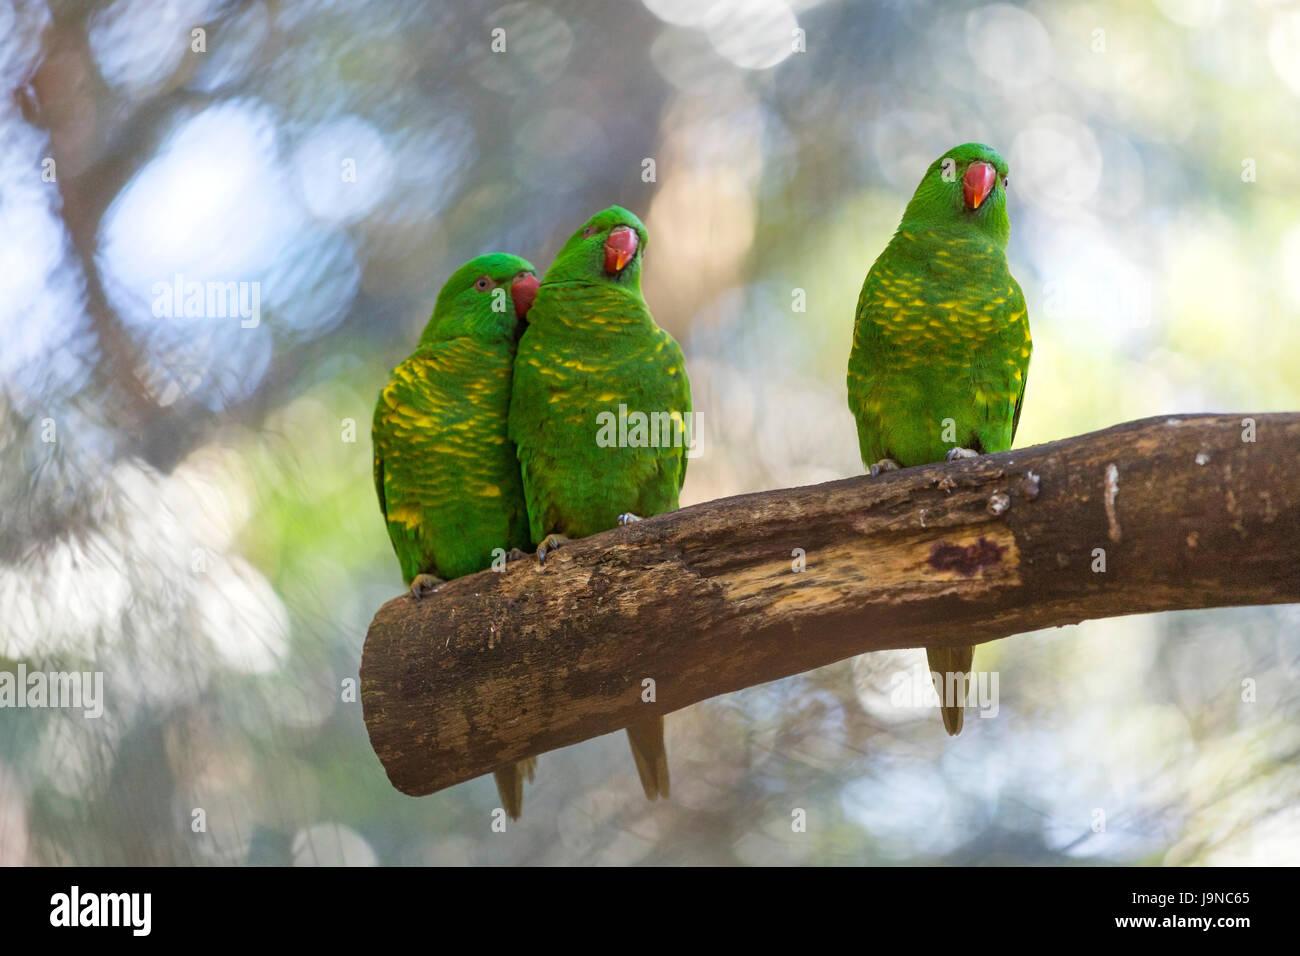 Parrots, Australia. - Stock Image